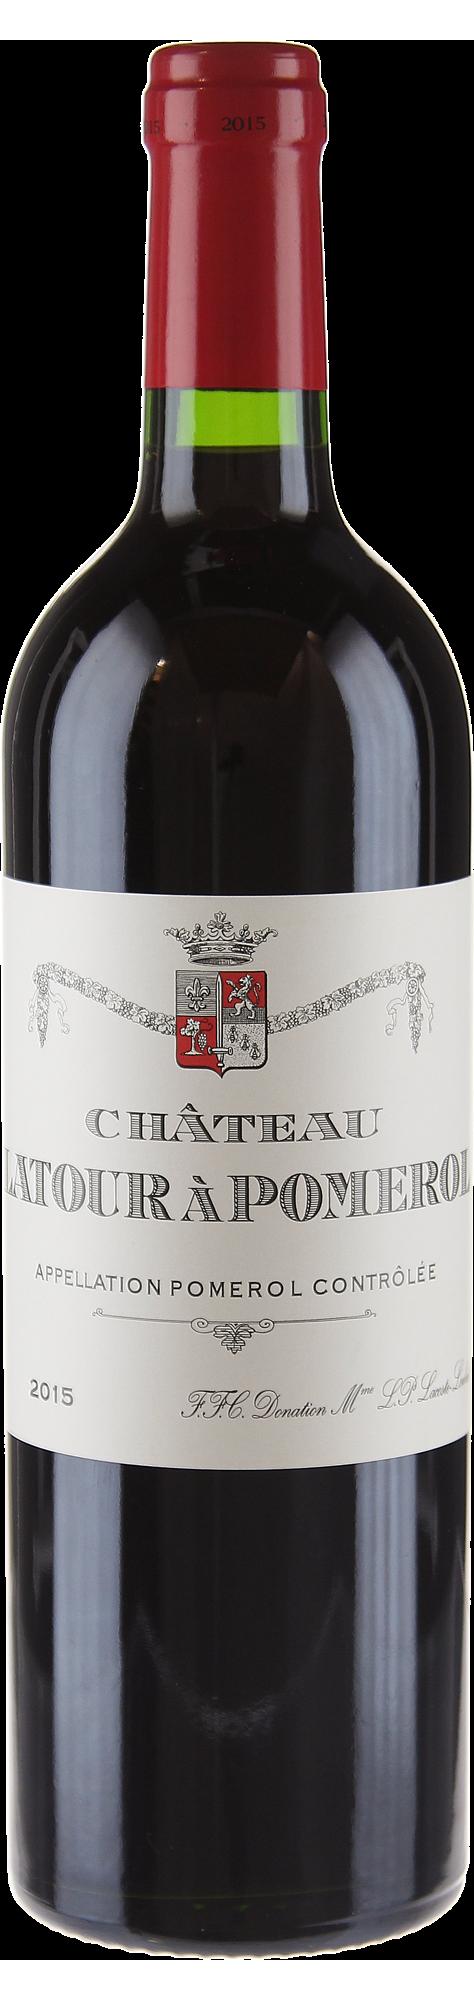 Latour Pomerol